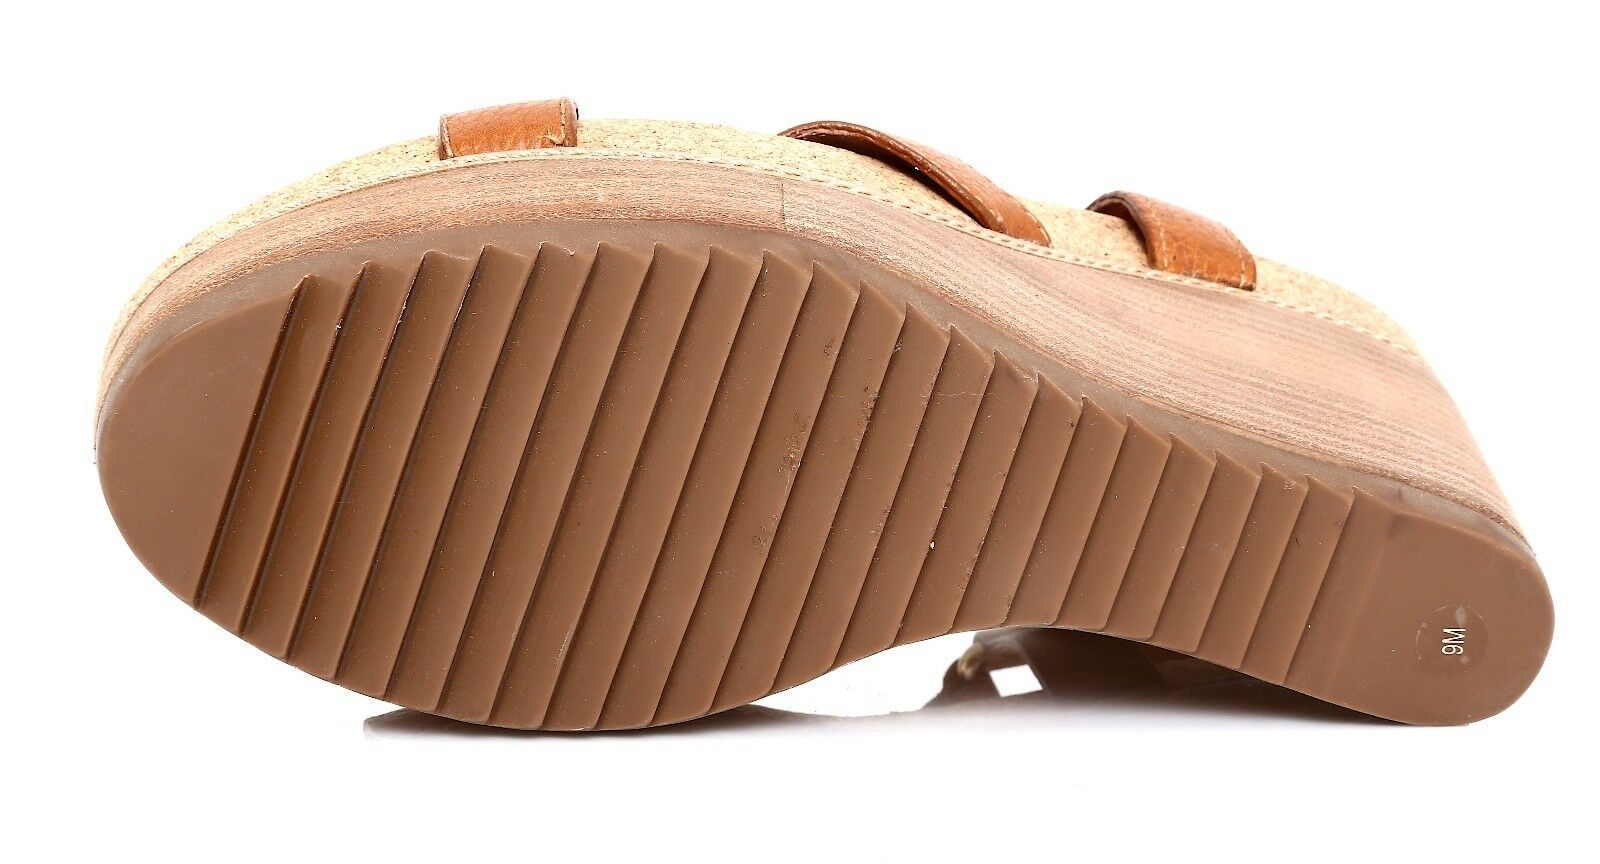 Tory Burch Ankle Strap Leather Leather Leather Wedge Sandal marron femmes Sz 9 M 1178 ec8e4c